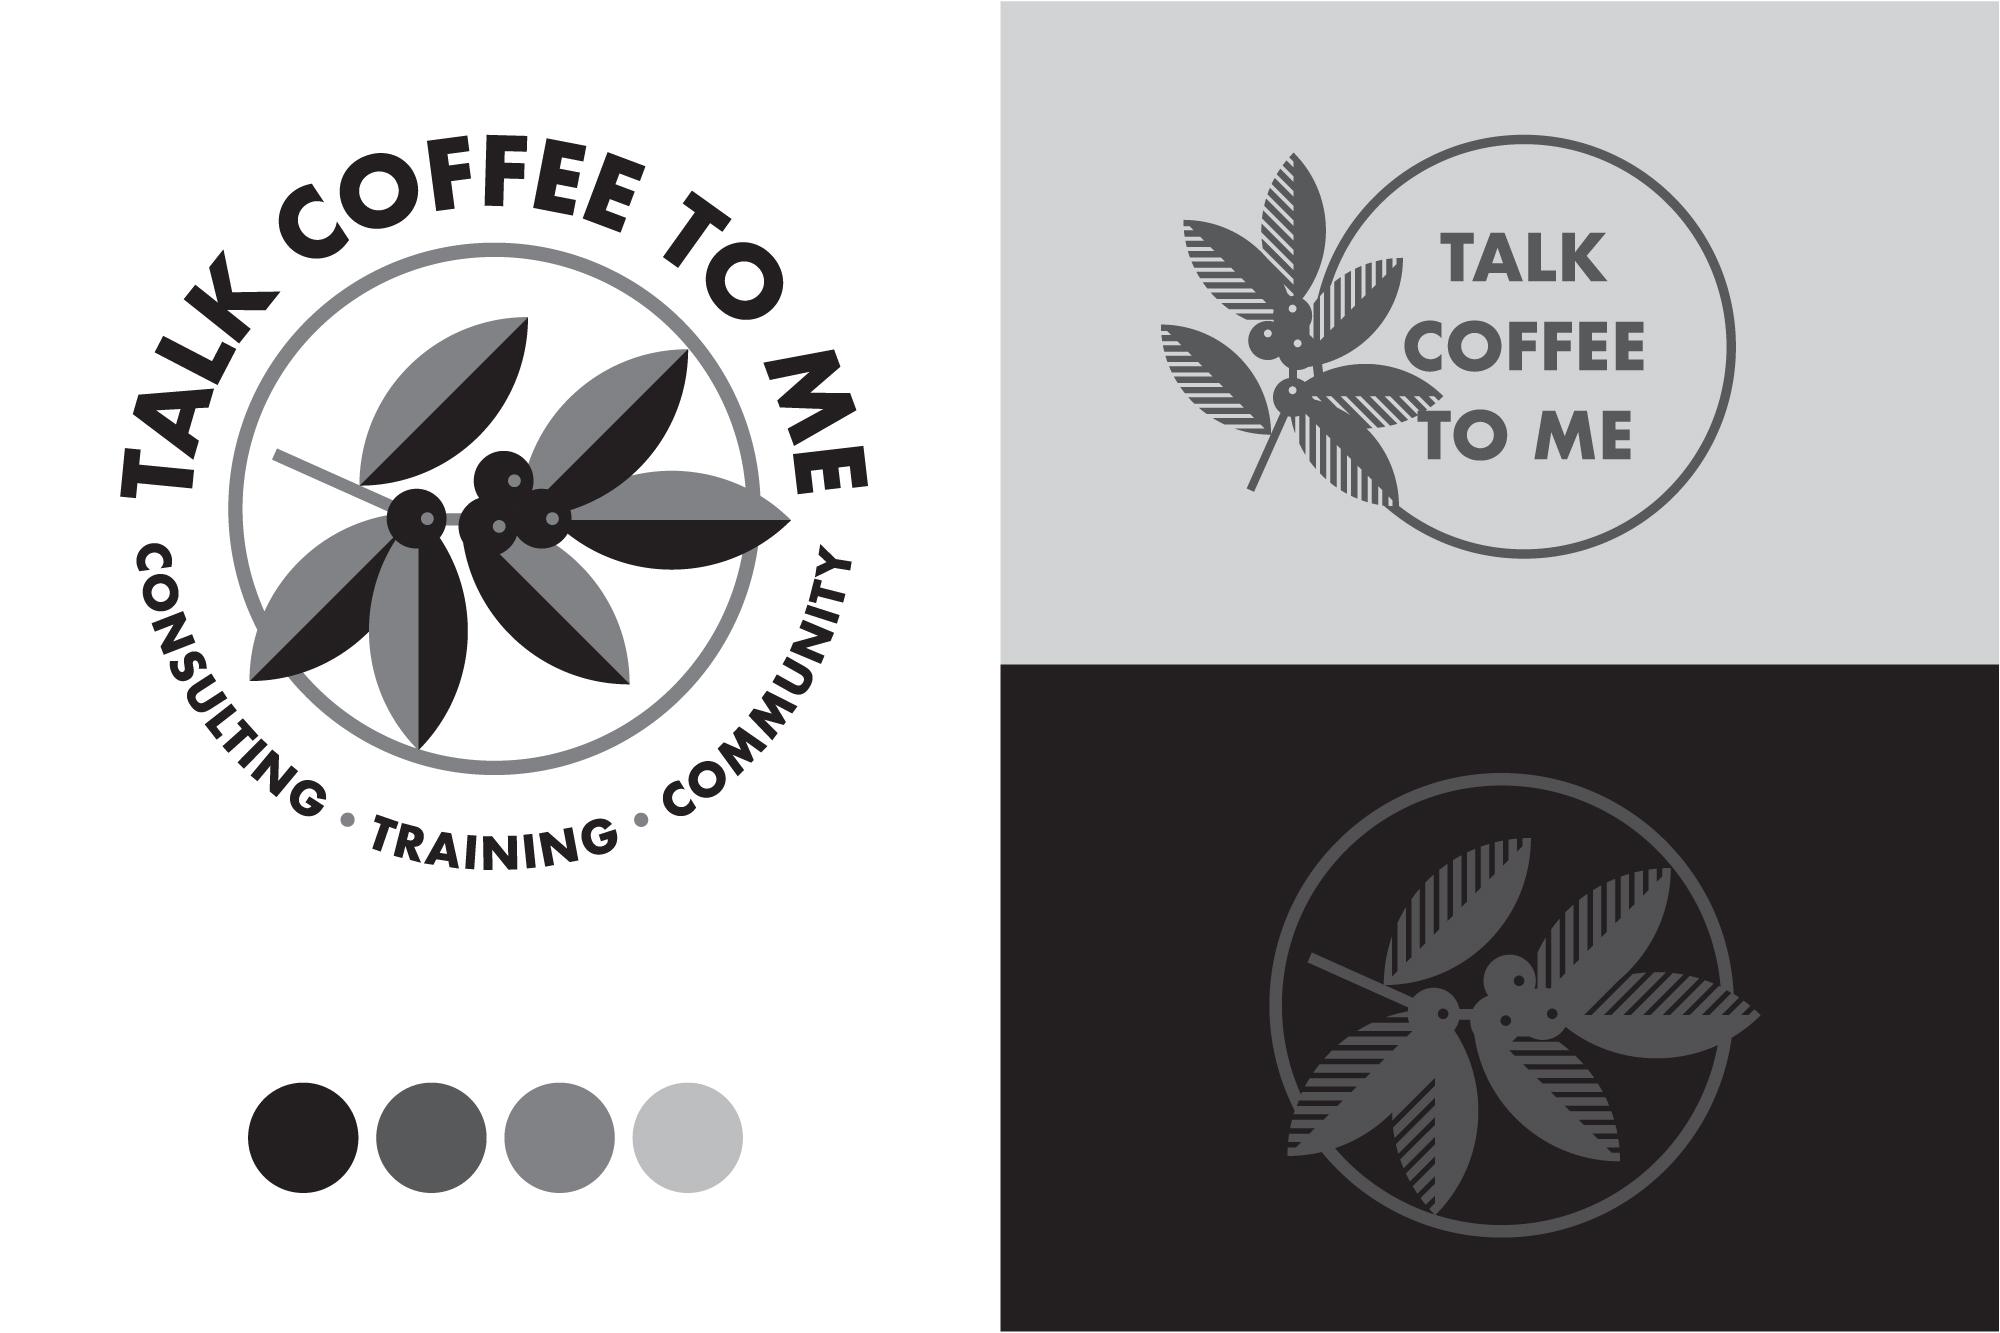 The-Creative-Canopy-TalkCoffee-Cover.jpg